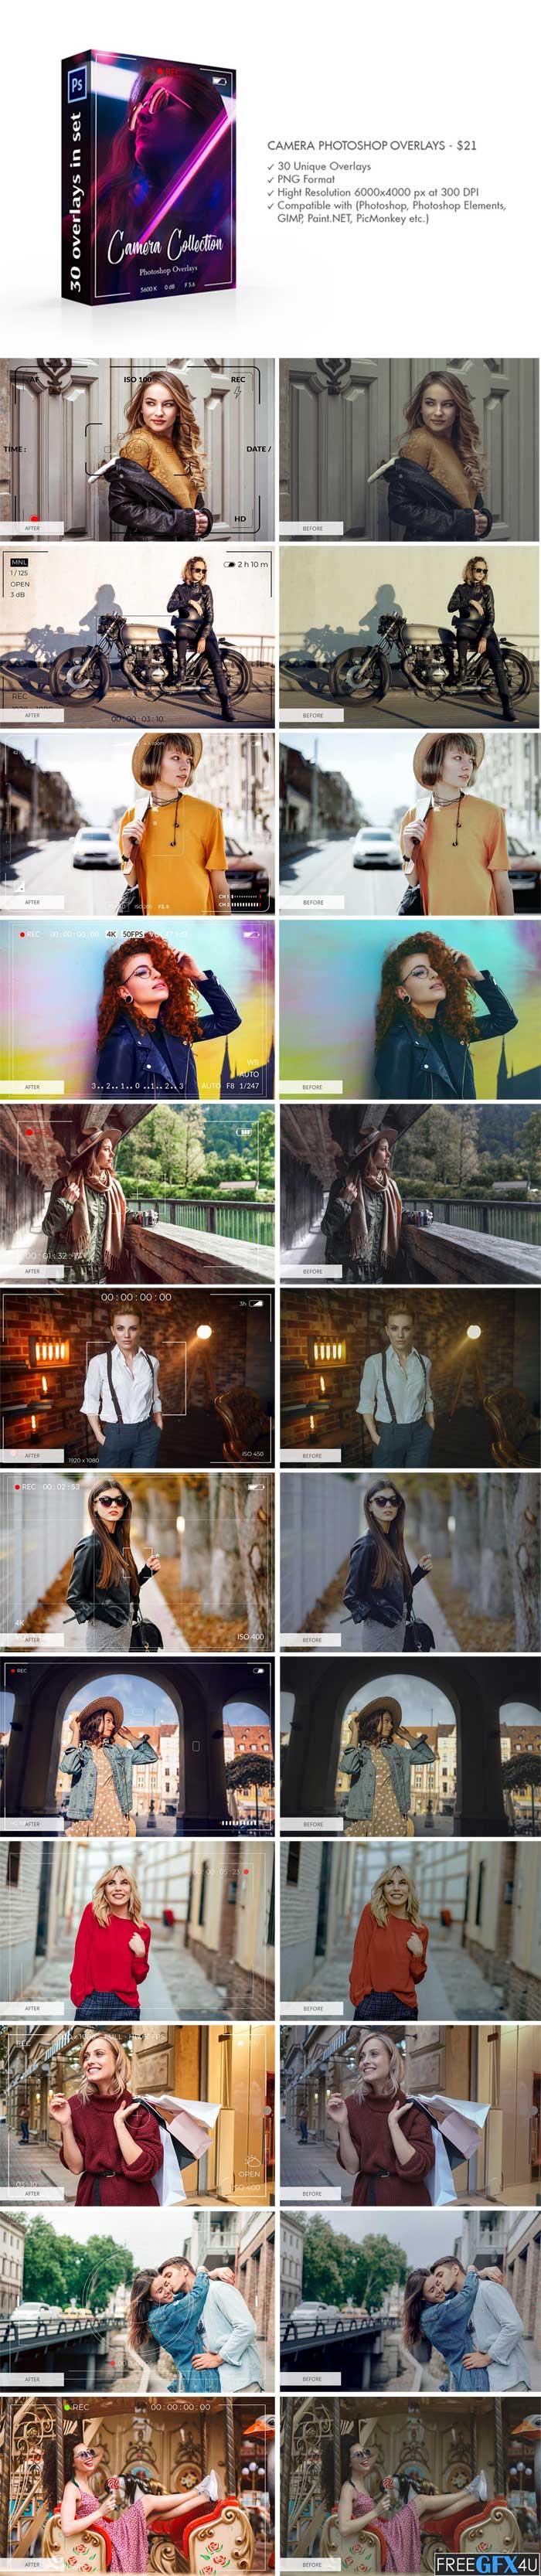 Camera Photoshop Overlays